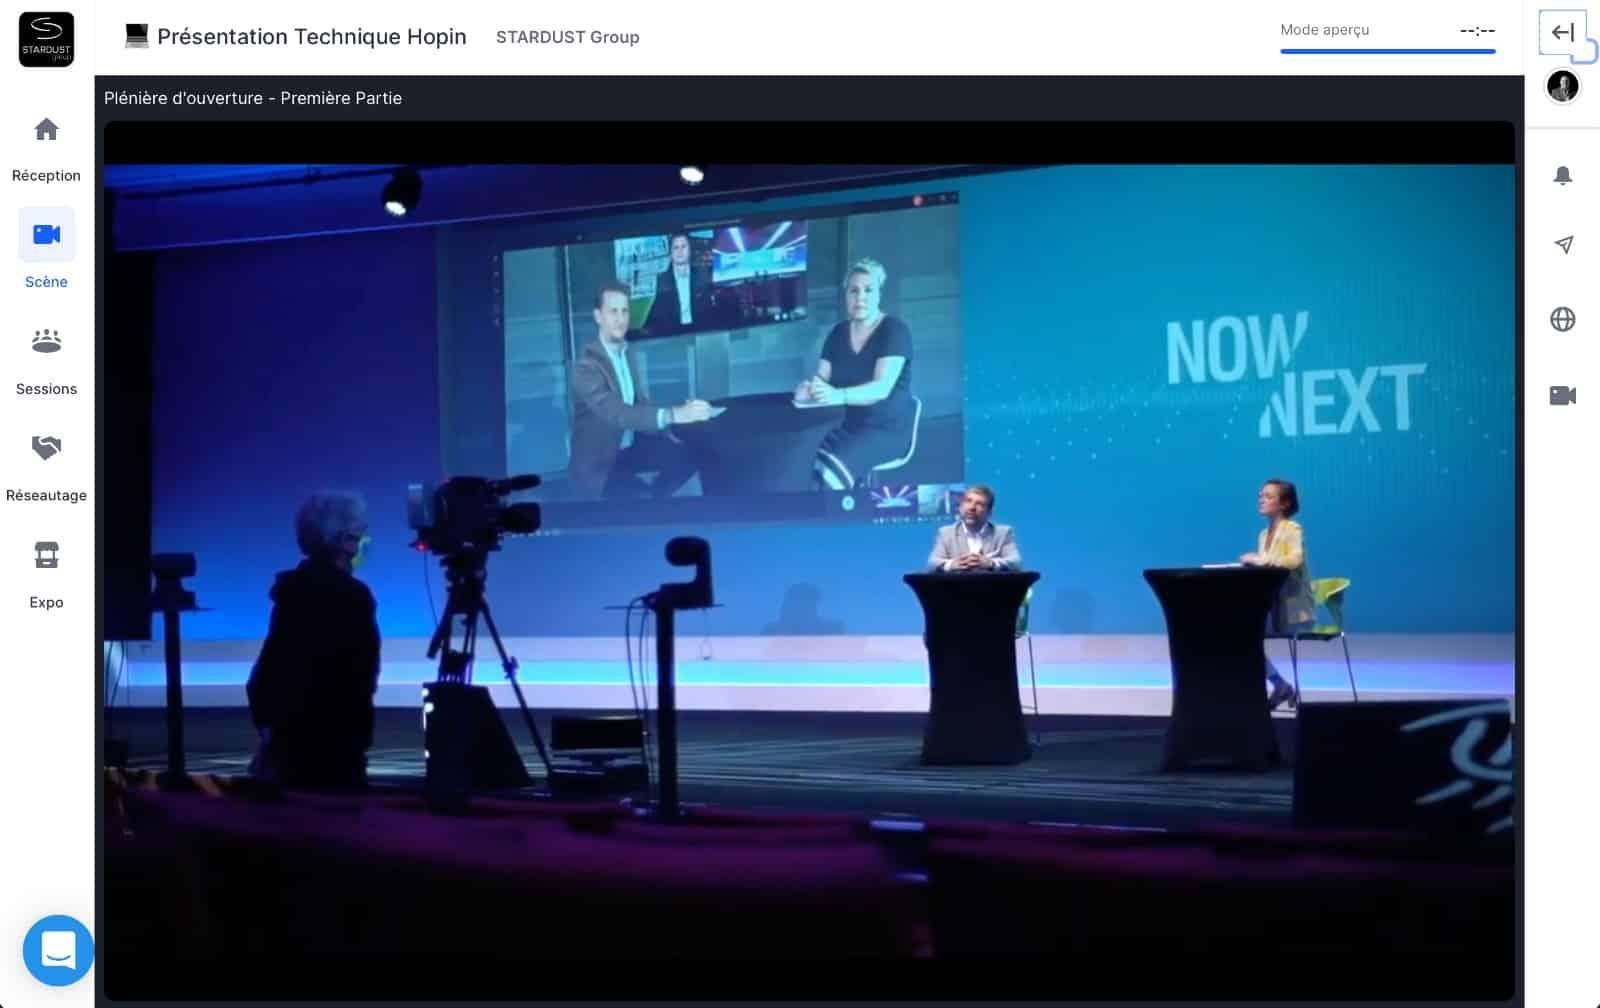 Solutions Digitales Hopin - Stage Plénière - STARDUST Group